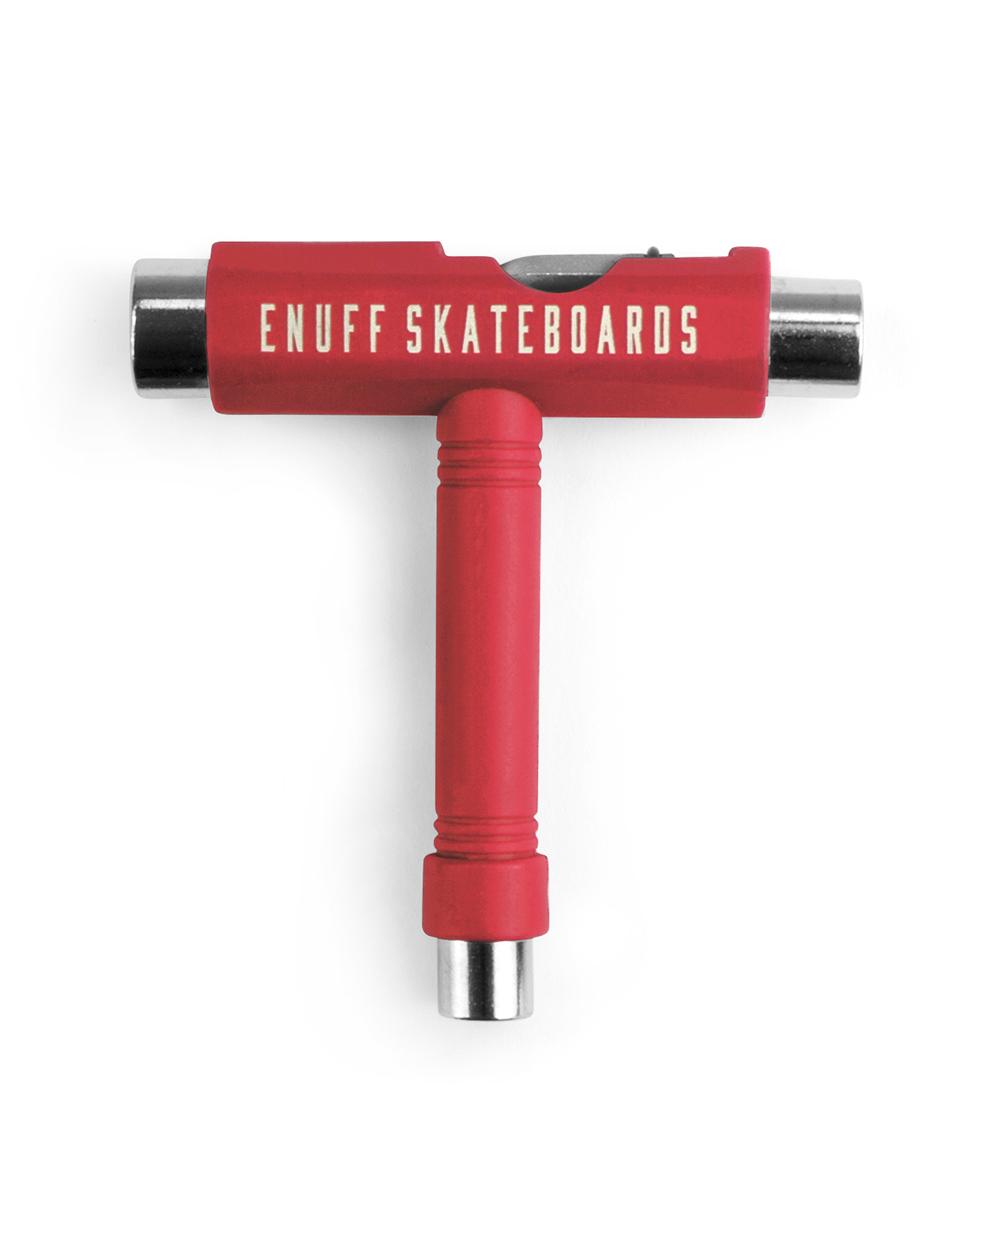 Enuff Chiave Multiuso Skateboard Essential Tool Red